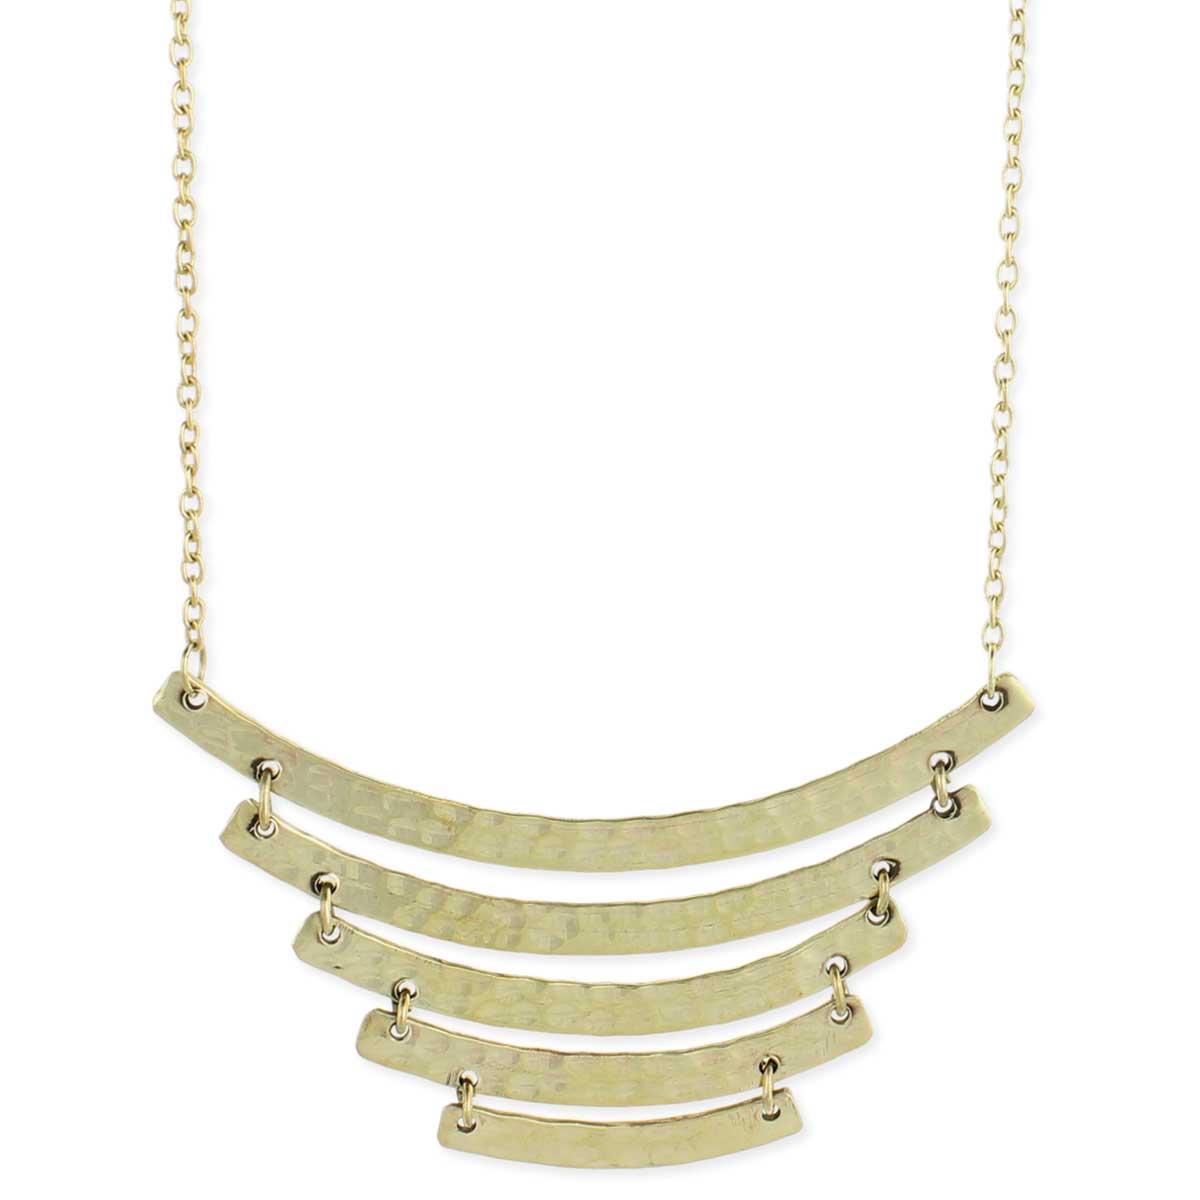 Gold Hammered Curved Bar Bib Necklace